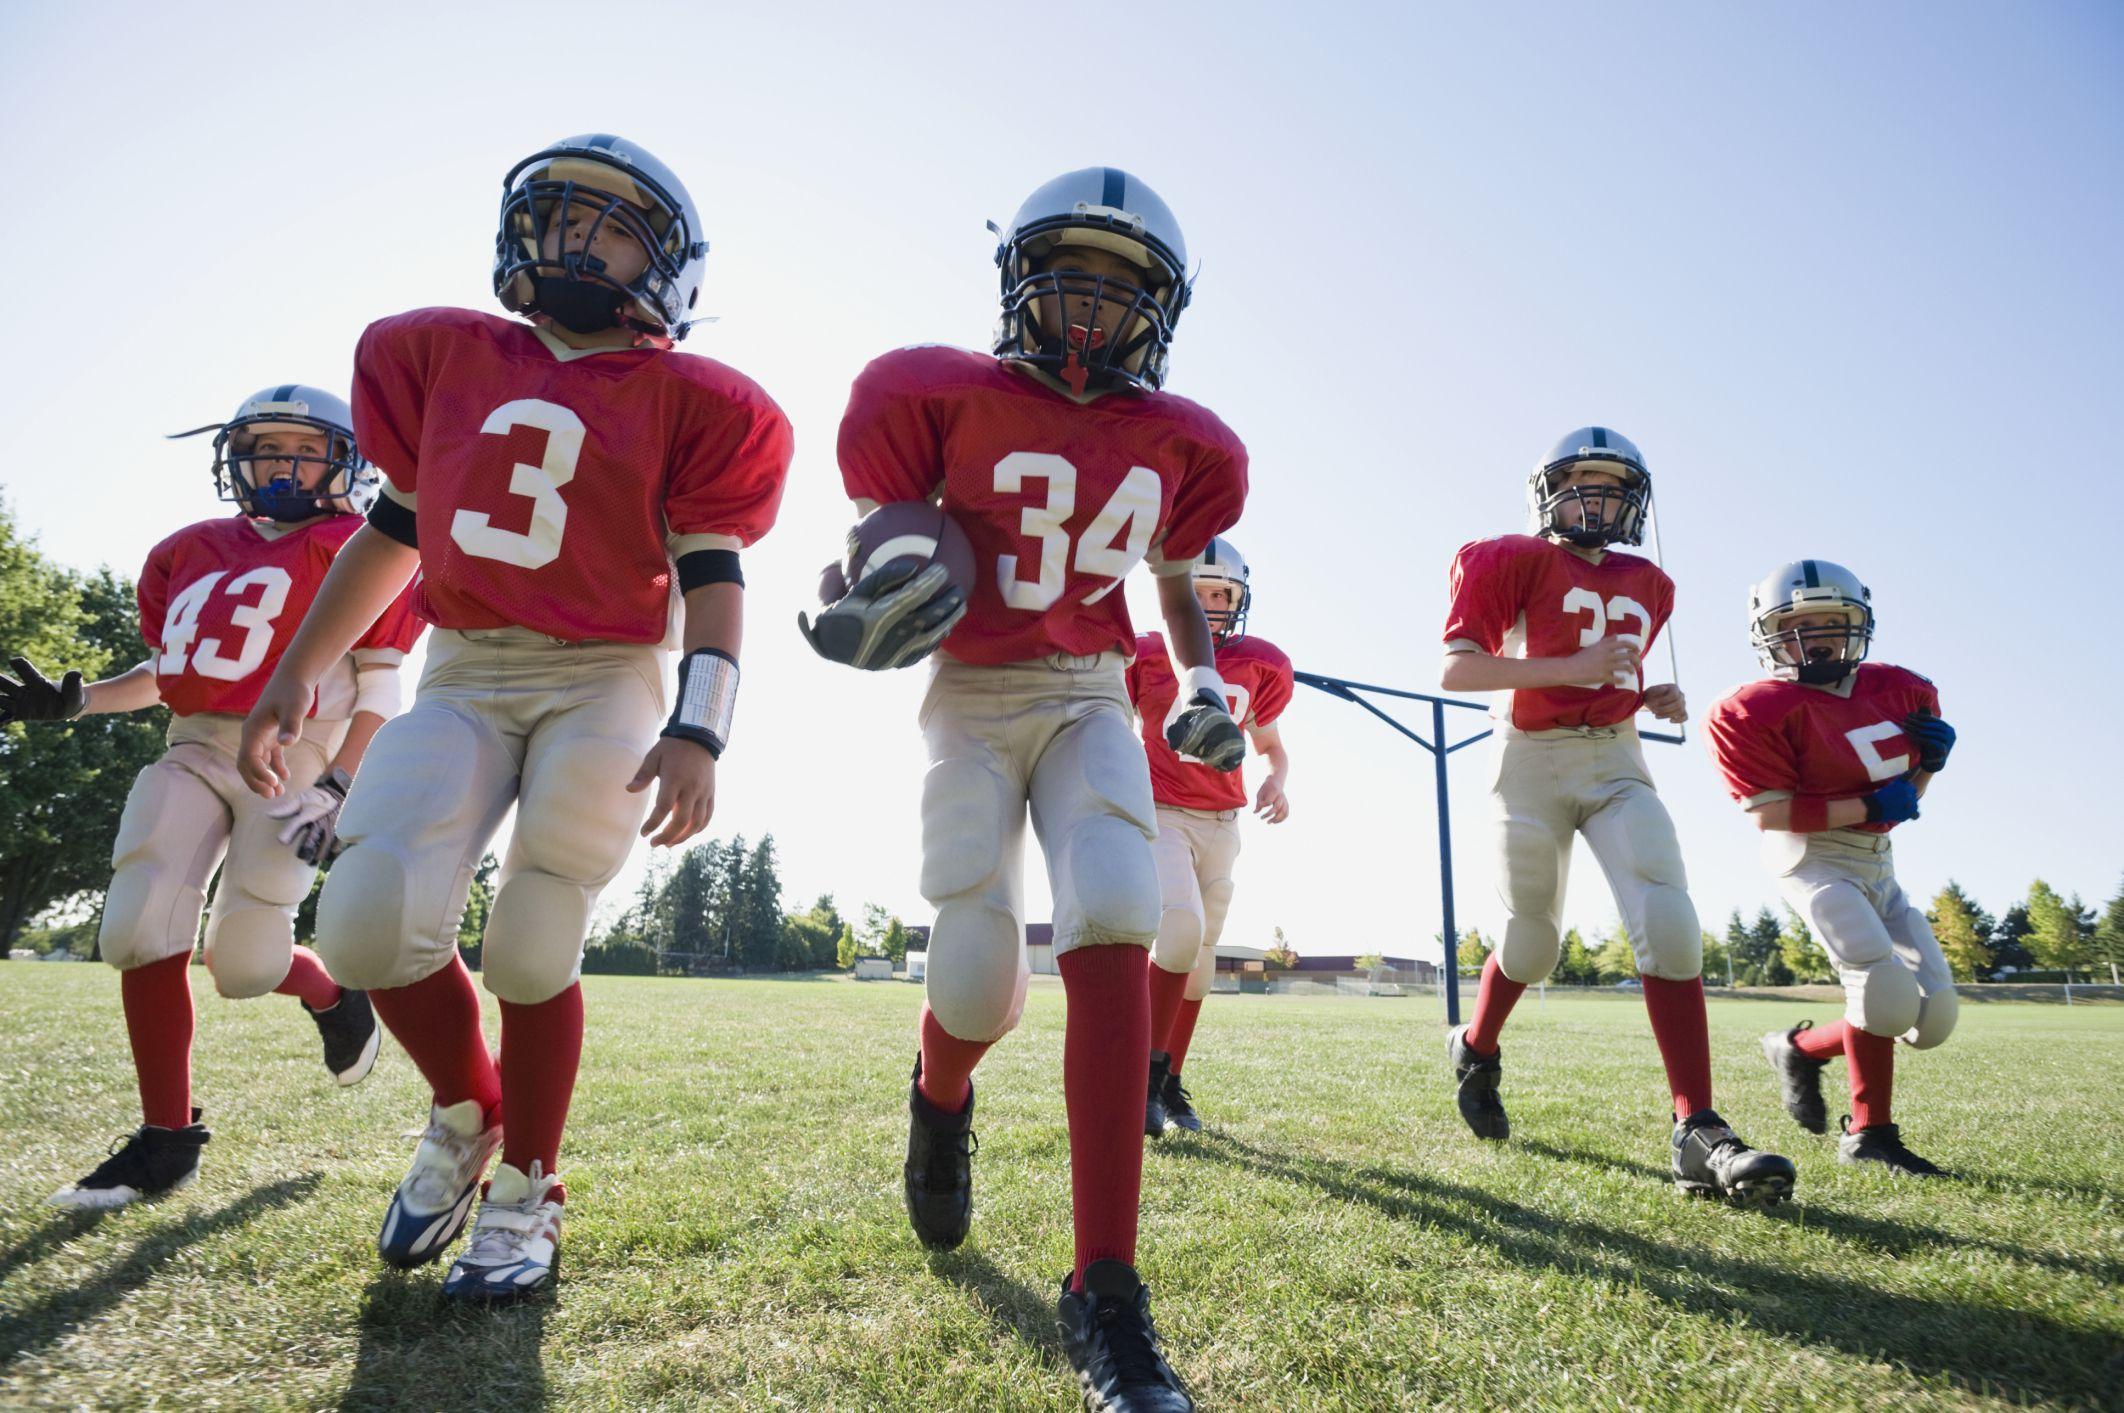 youth sports 2 essay